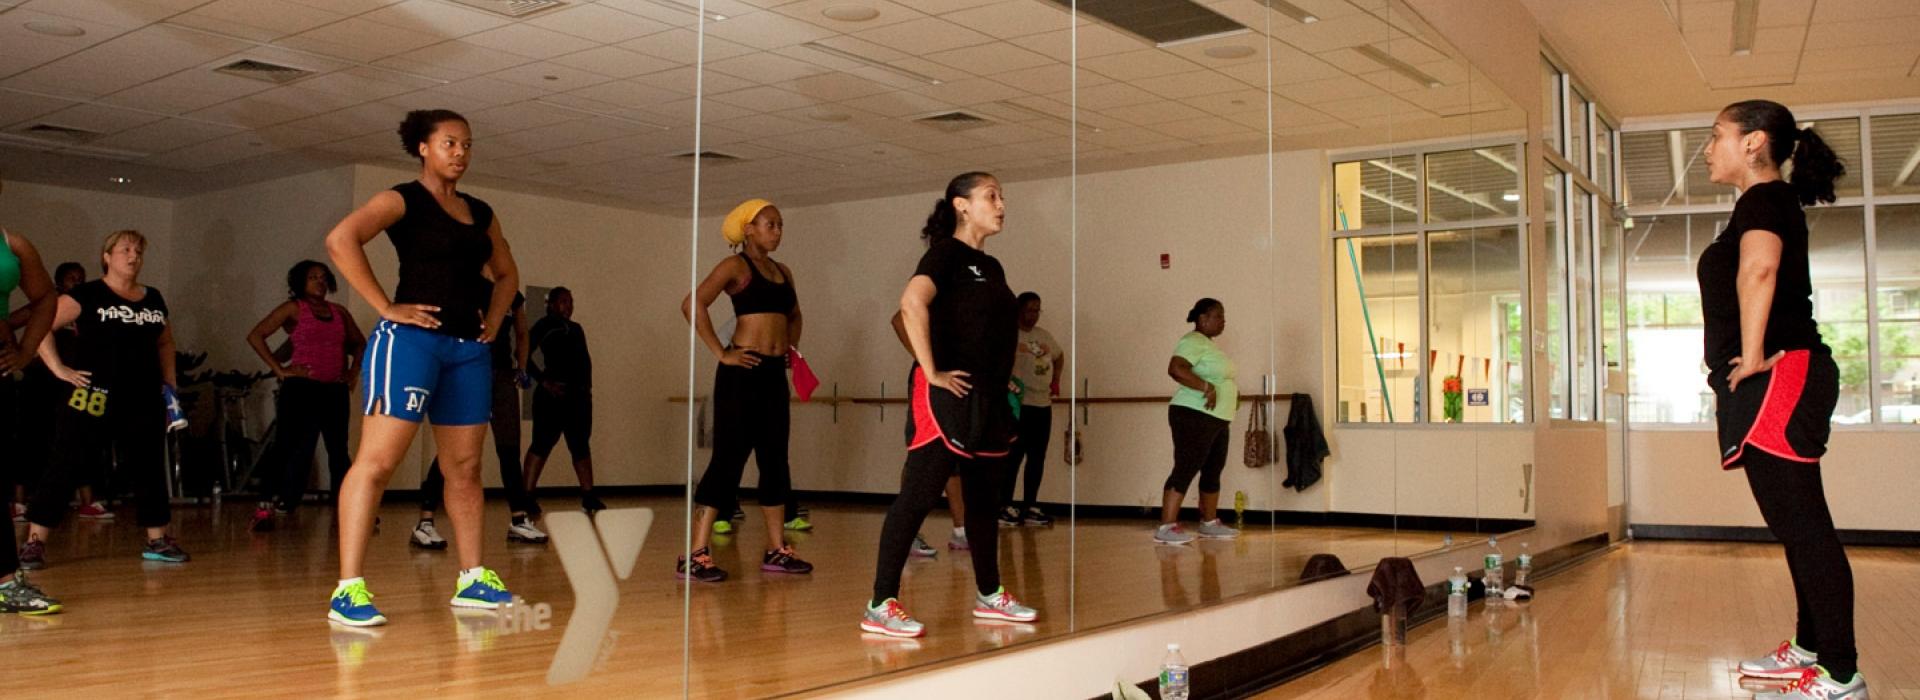 About Coney Island YMCA   NEW YORK CITY'S YMCA